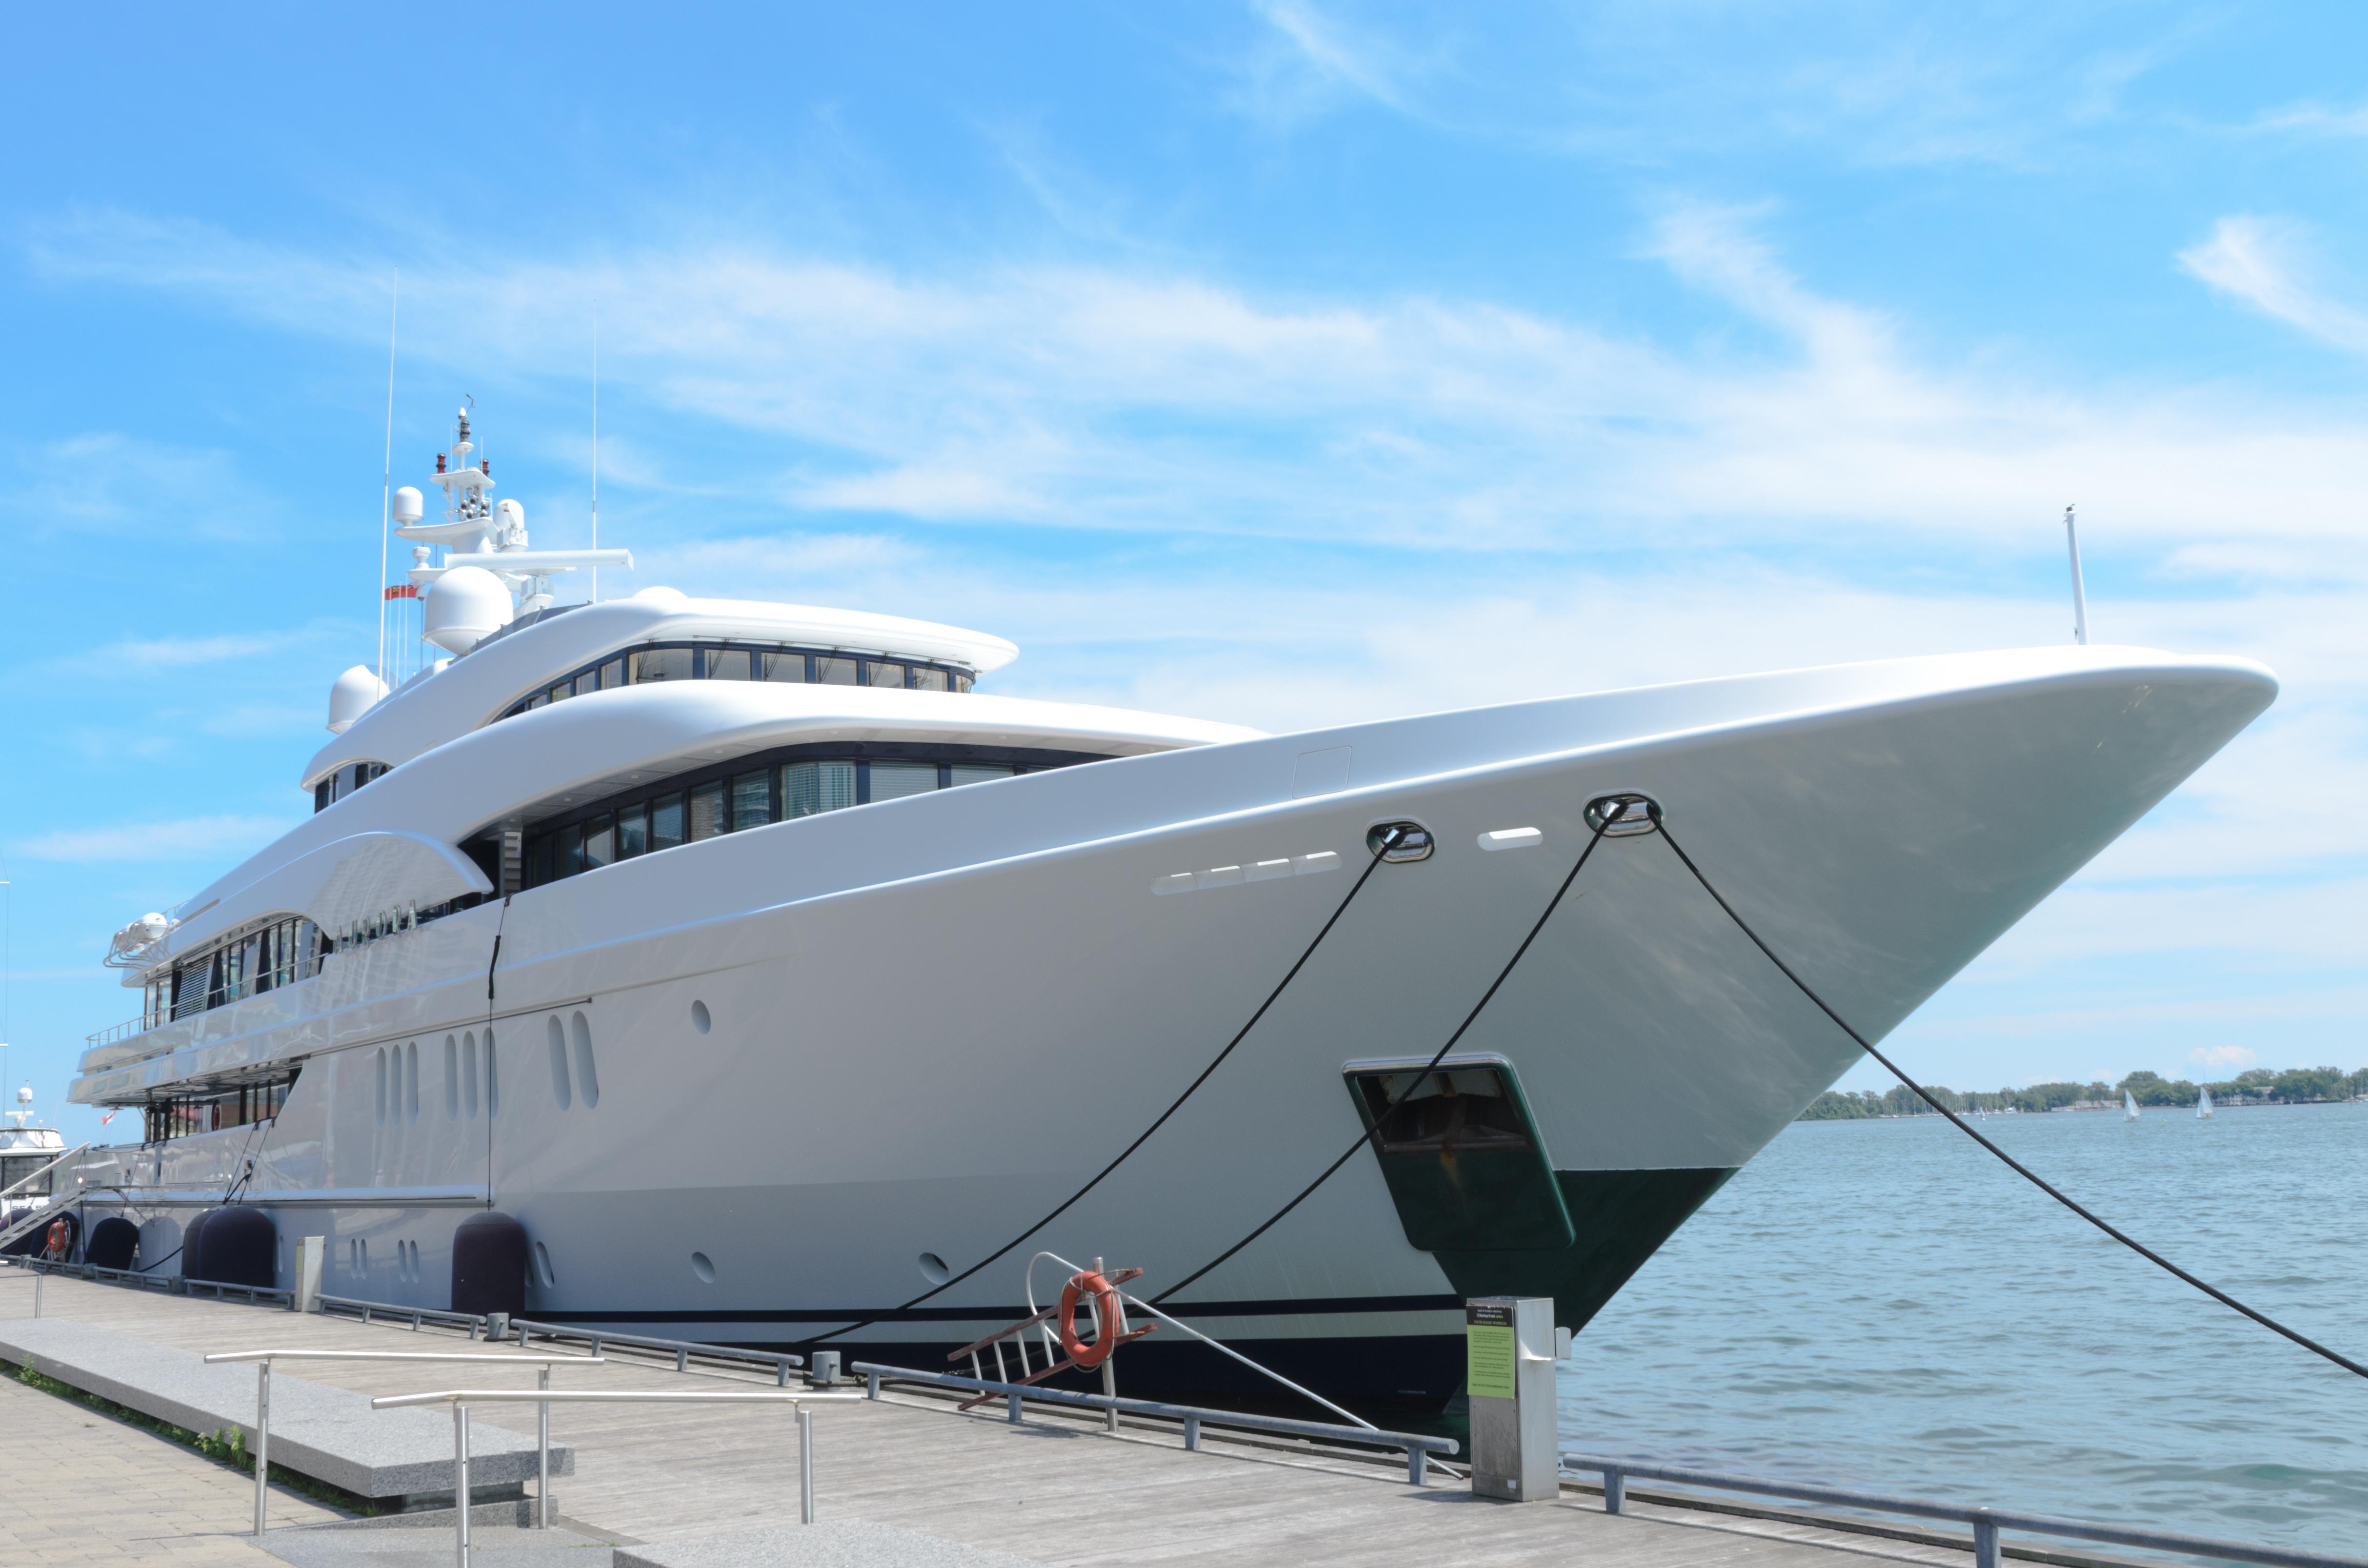 Yacht, Boat, Port, River, Sea, HQ Photo